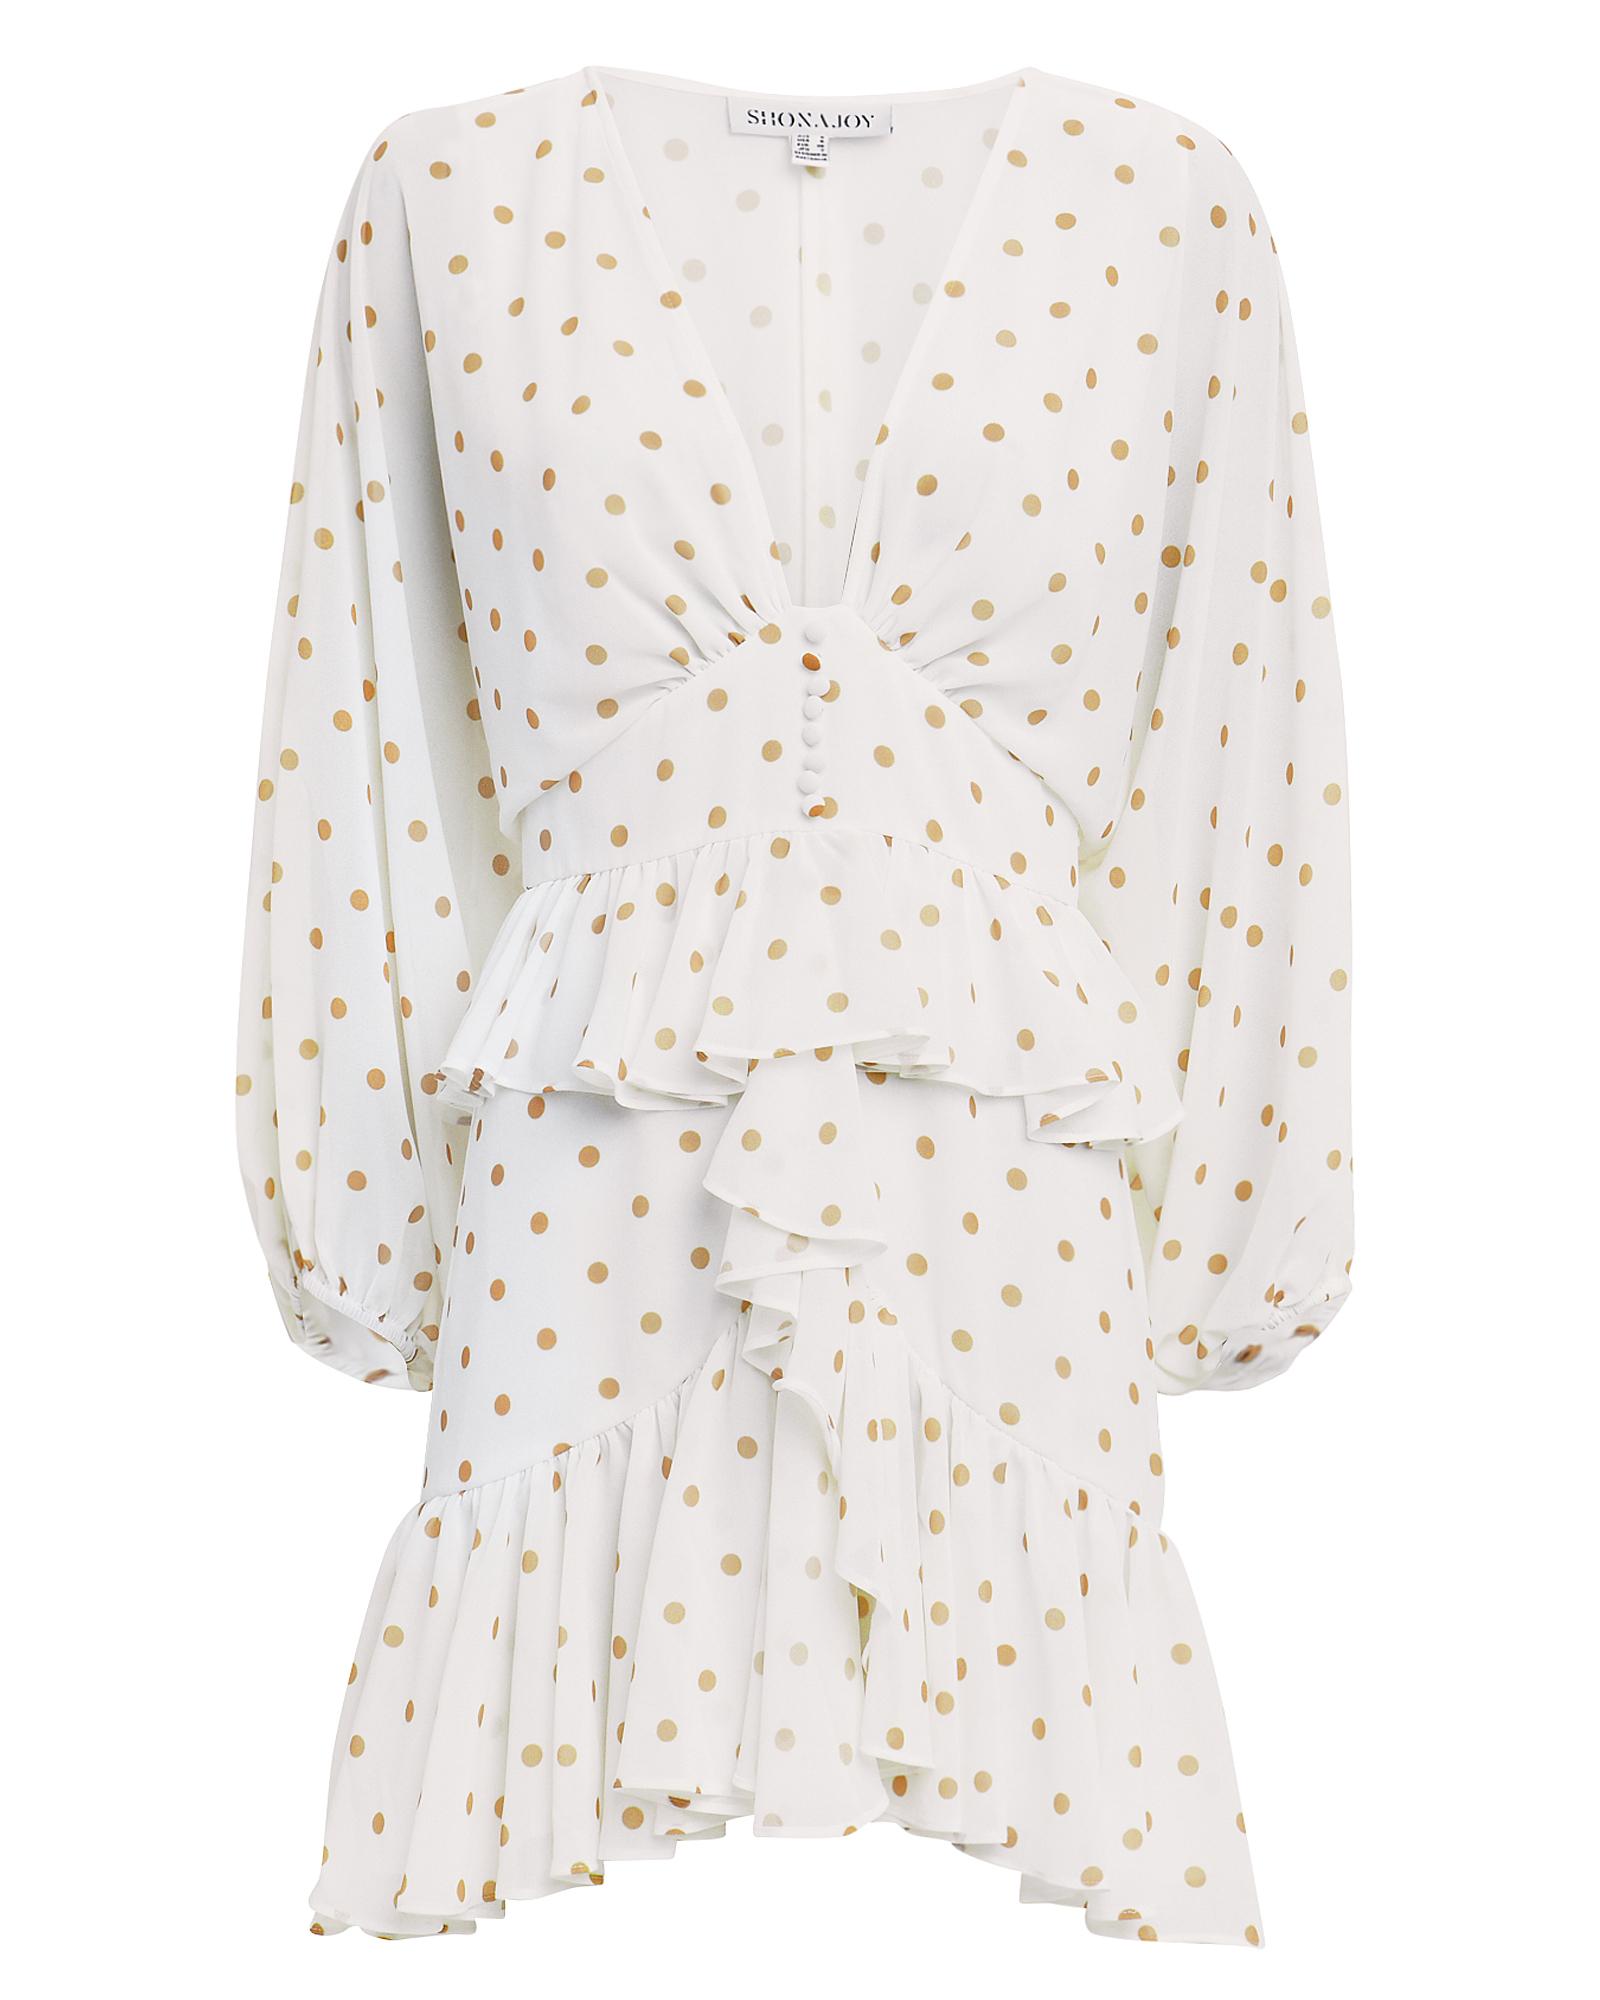 SHONA JOY Sophia Dot-Print Plunged V-Neck Ruffle Mini Peplum Dress in White